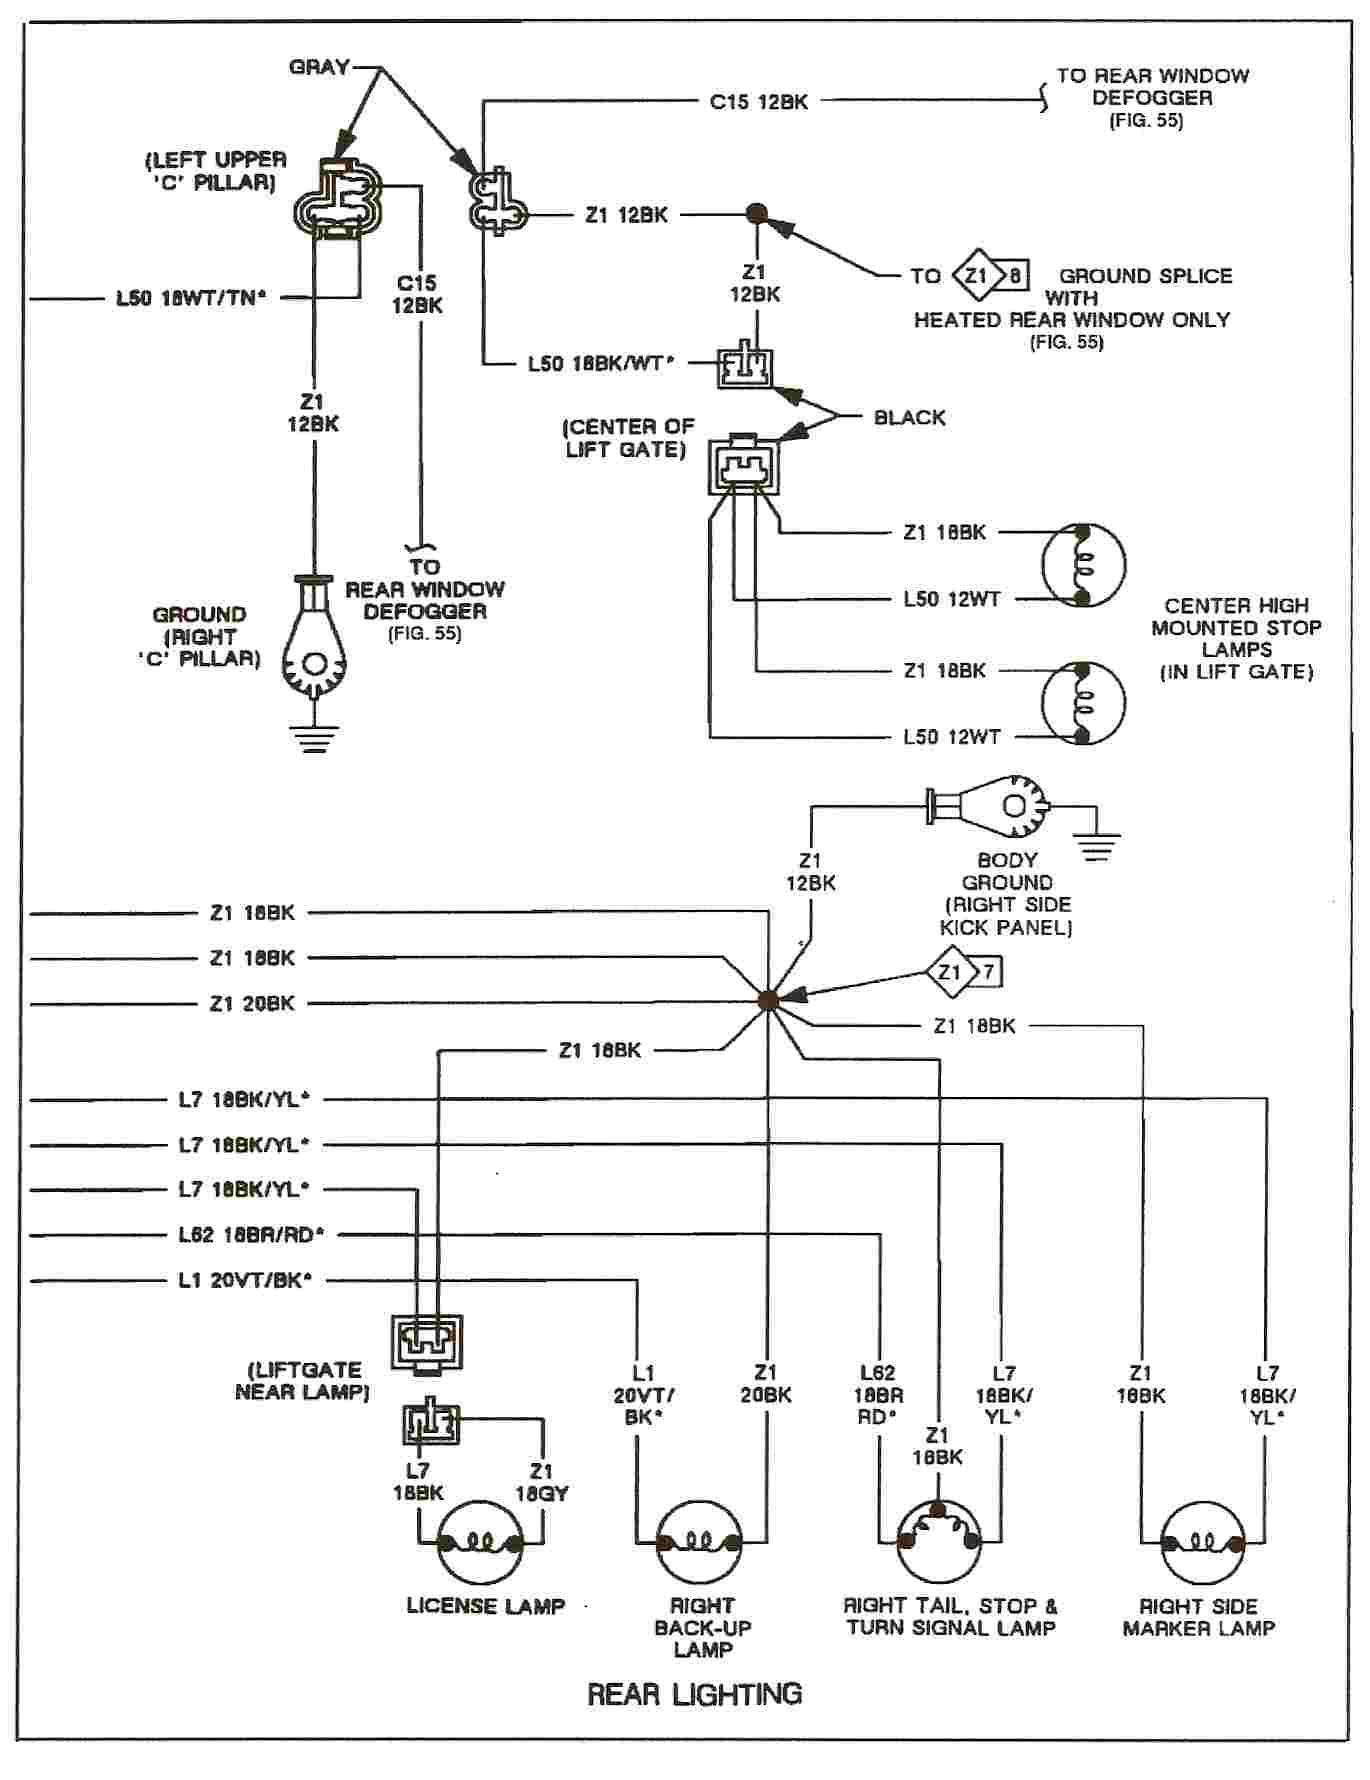 2016 Ram 2500 Wiper Wiring Diagram Diagram] Dodge Ram Light Wiring Diagram Full Version Hd Quality … Of 2016 Ram 2500 Wiper Wiring Diagram